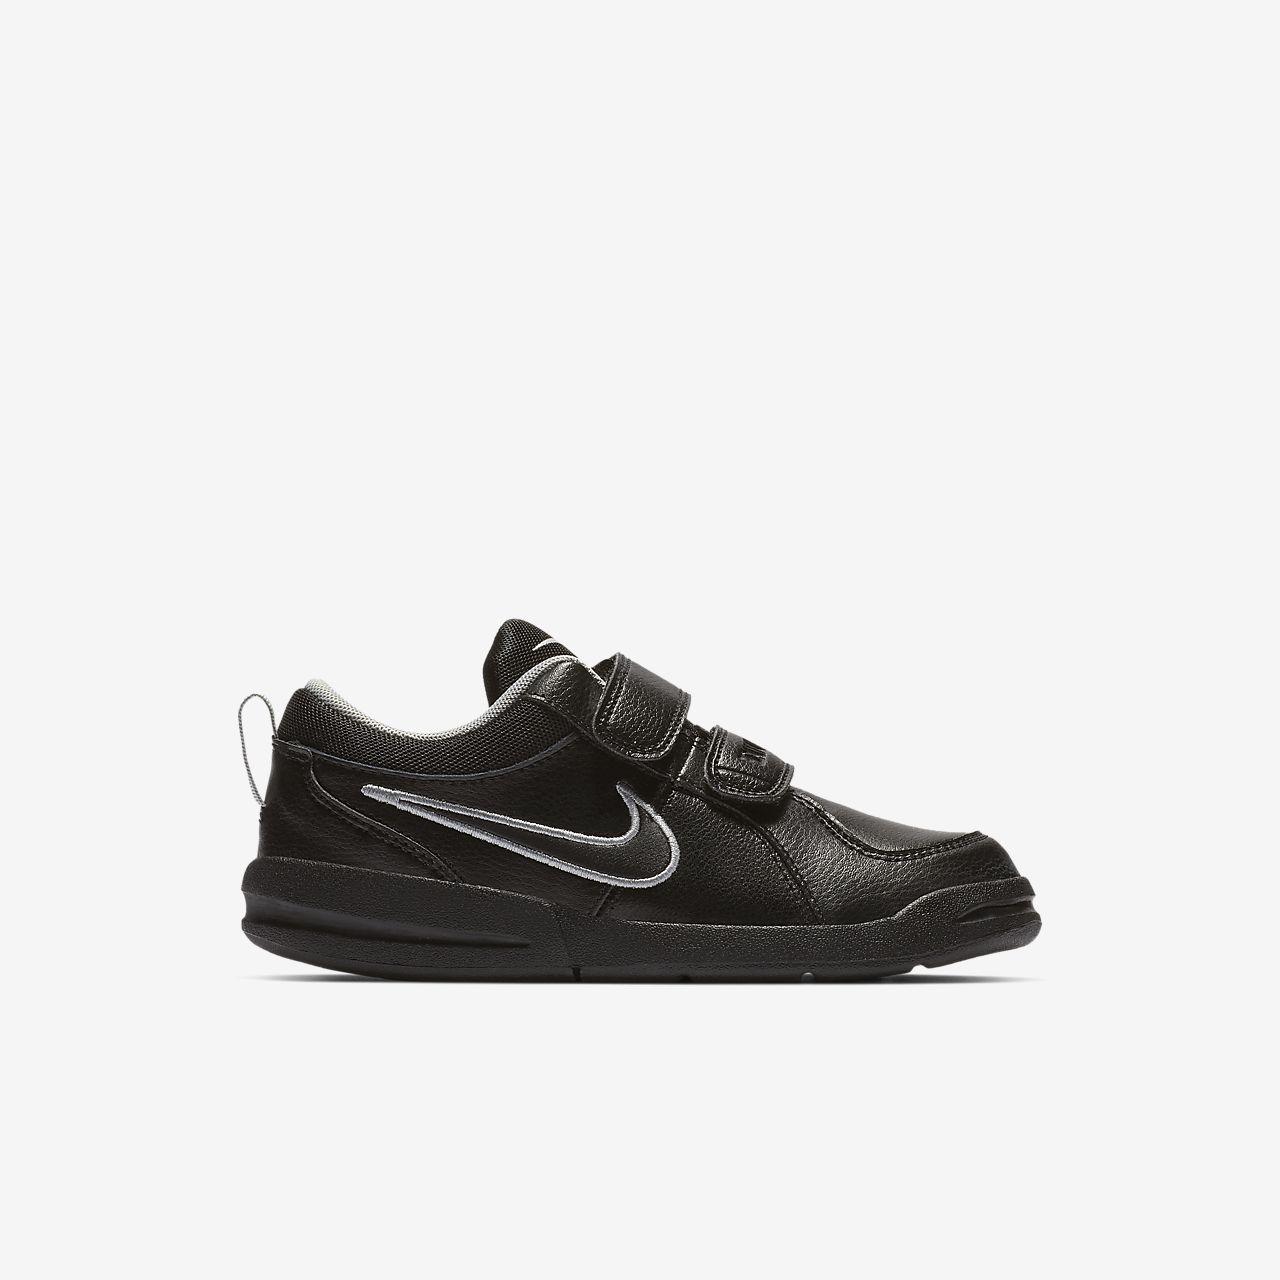 66de222340a8 Pico Dk Nike Sko Børn Til Små 4 dgfqRT